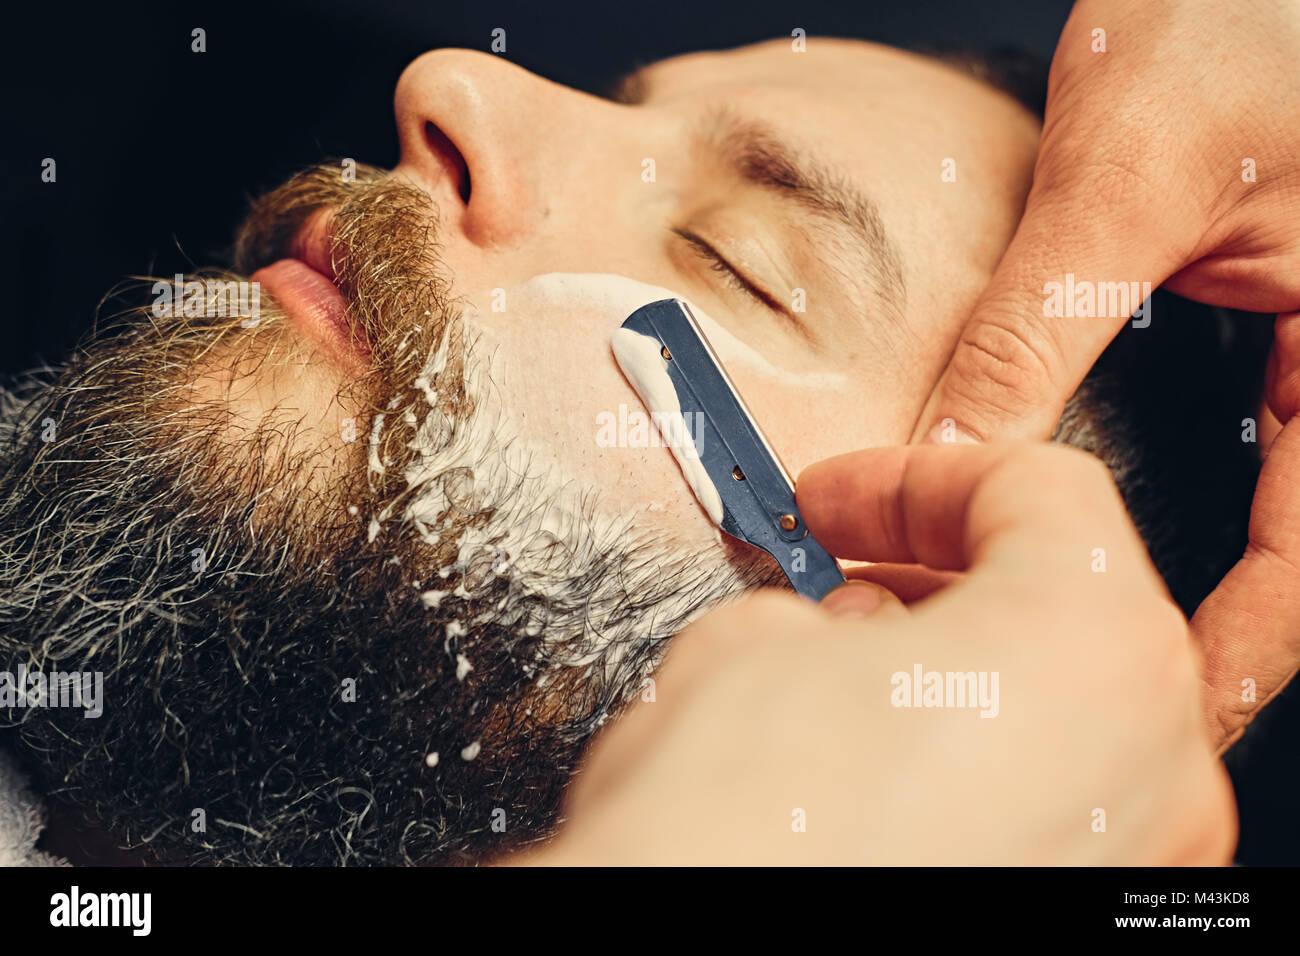 Barber shaving bearded male with a sharp razor. - Stock Image